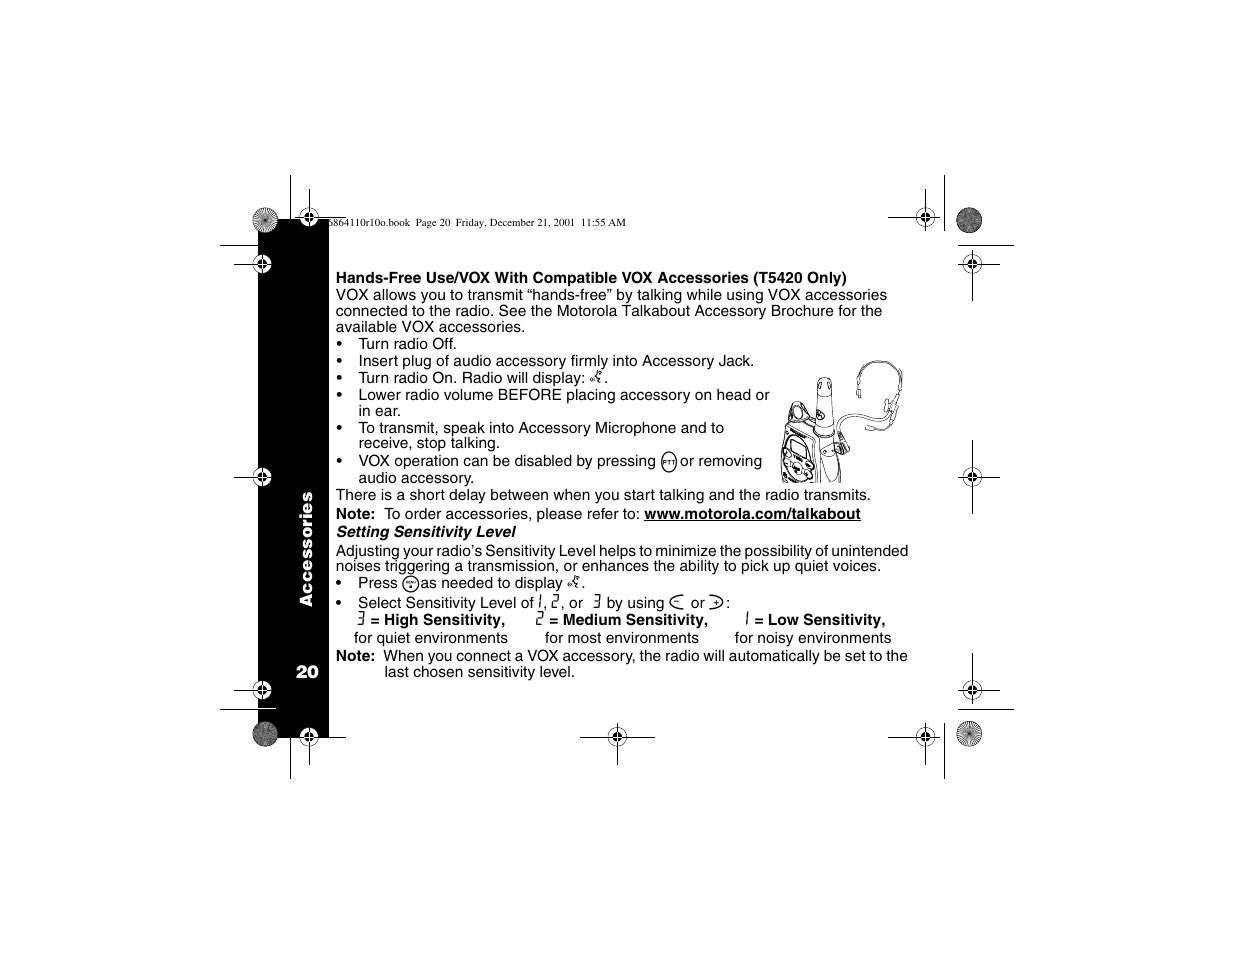 vox accessories motorola t5410 user manual page 24 40 rh manualsdir com User Manual motorola t6510 manual pdf